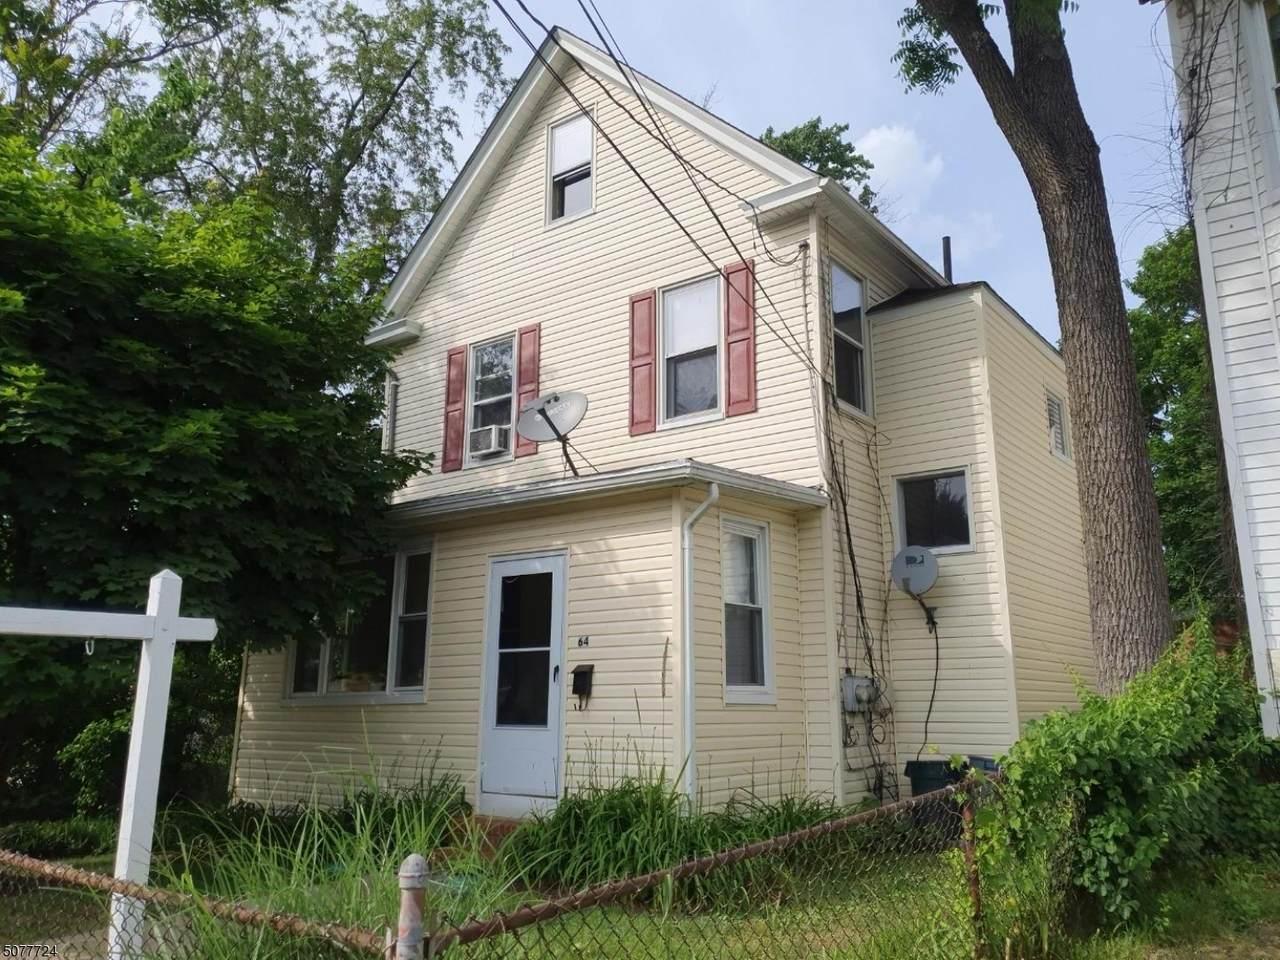 64 Abbett Ave - Photo 1